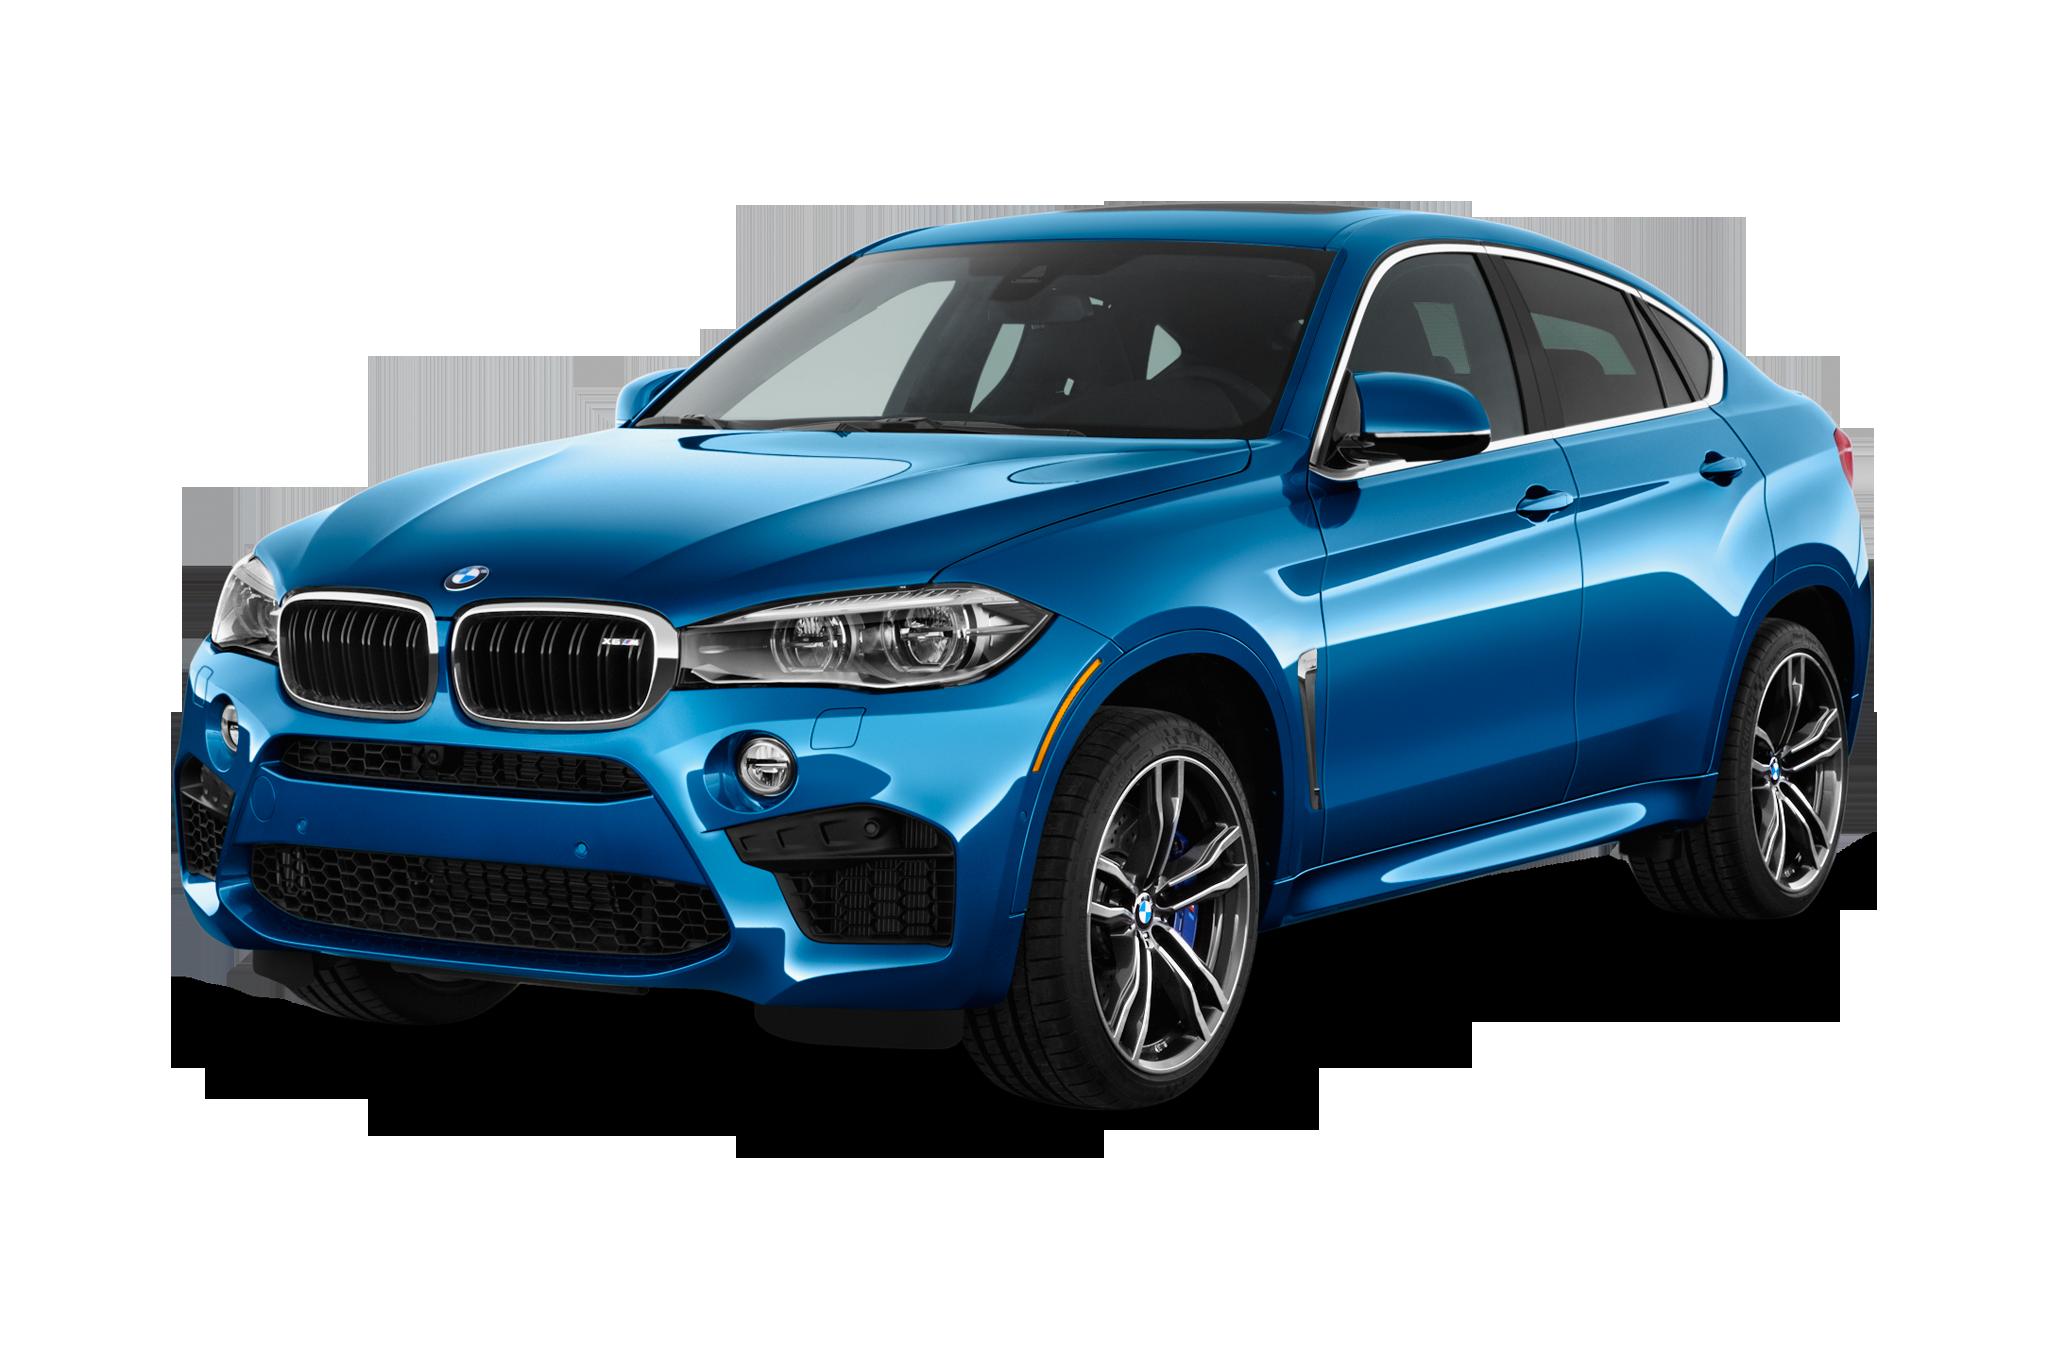 Bmw X6 0 60 New Car Release Information